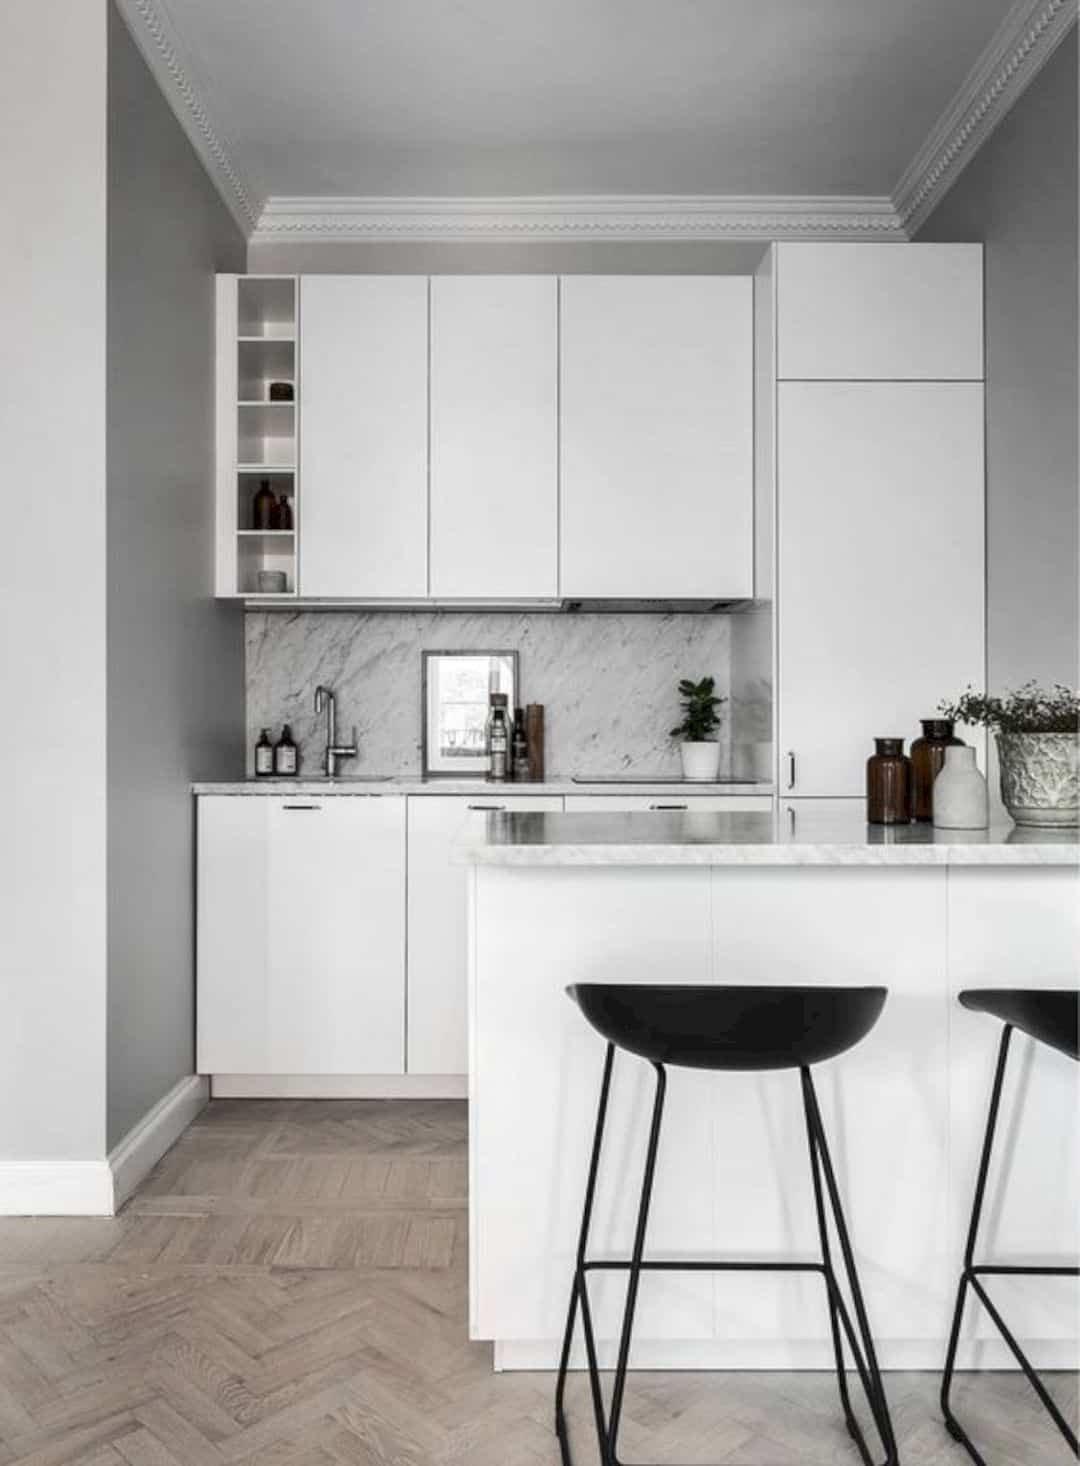 Kitchen Decor Ideas for Apartment New 15 top Apartment Kitchen Designs